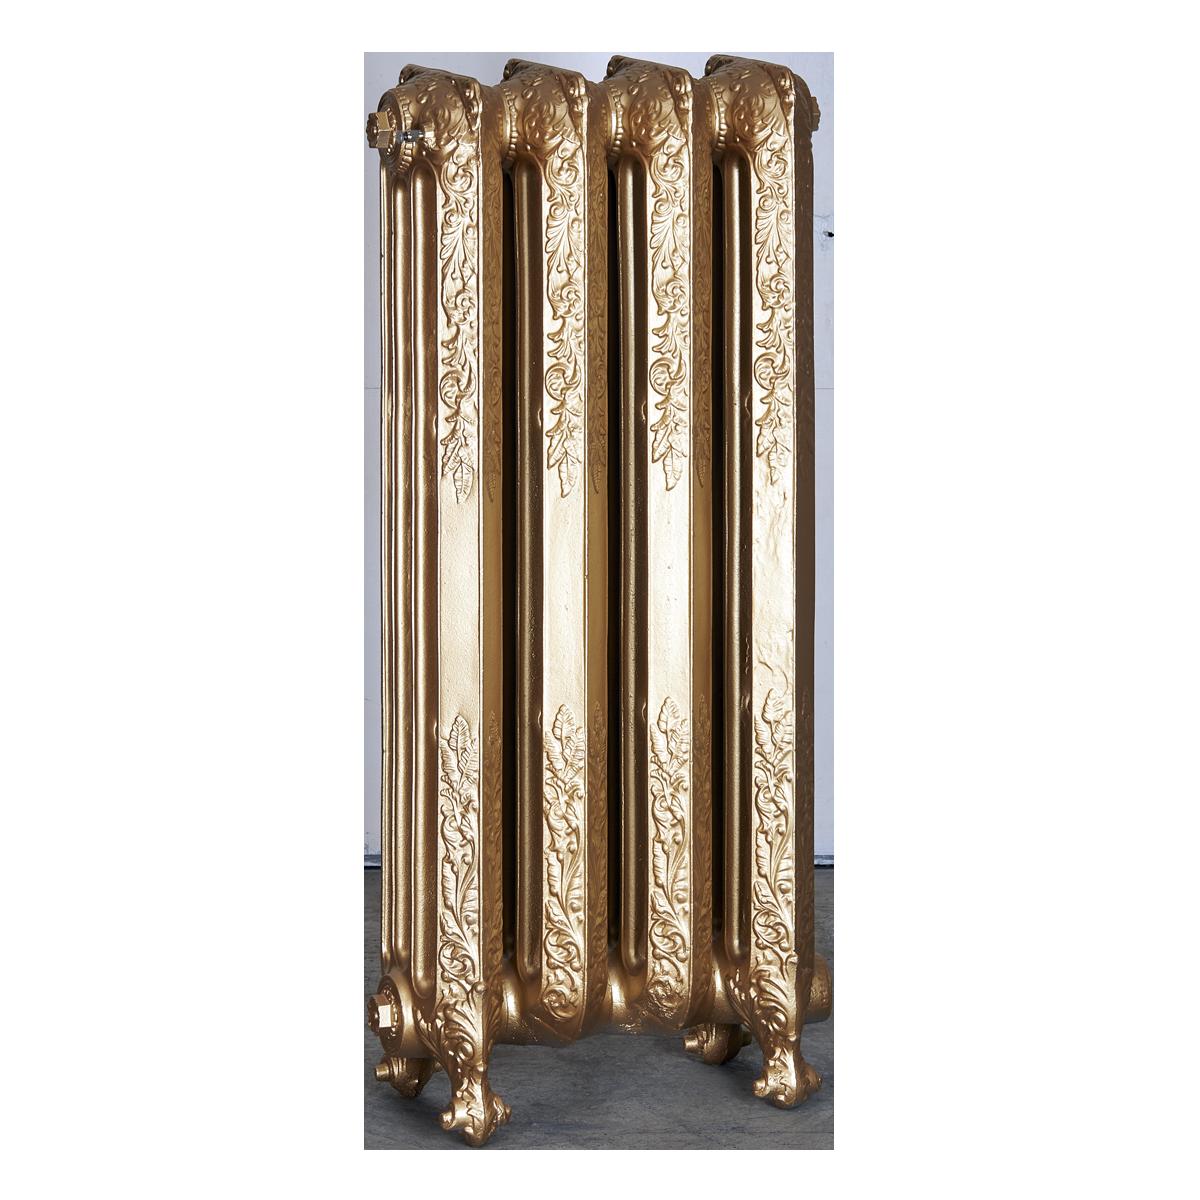 Ironworks Radiators Inc. refurbished cast iron radiator Christie in Pale Gold metallic